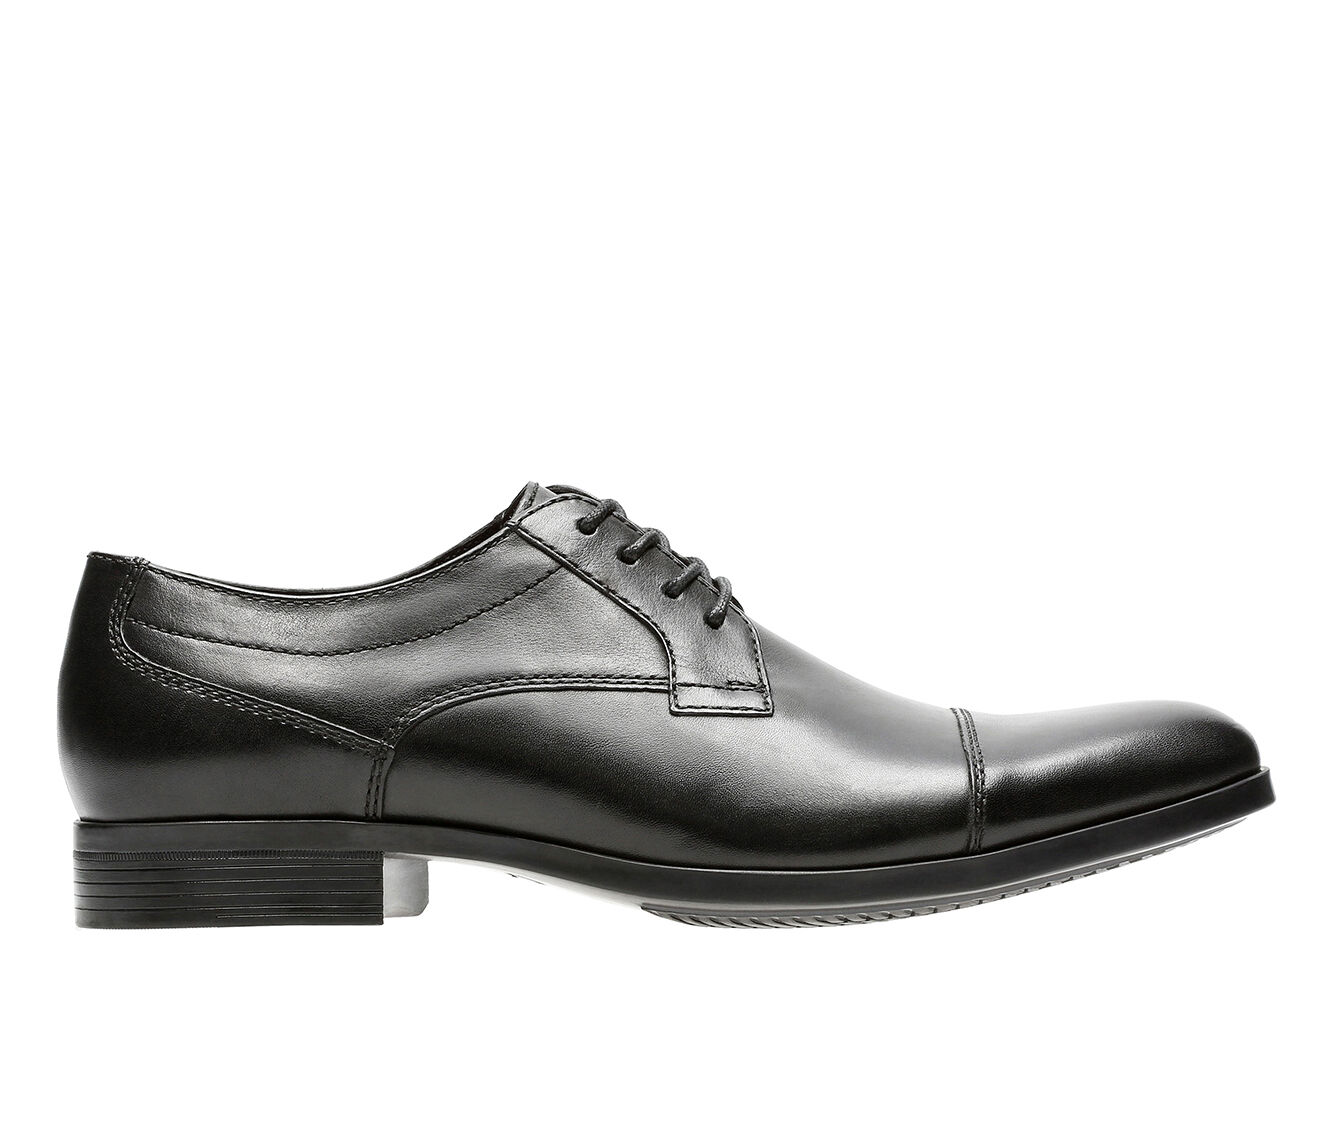 Men's Clarks Conwell Cap Dress Shoes Black